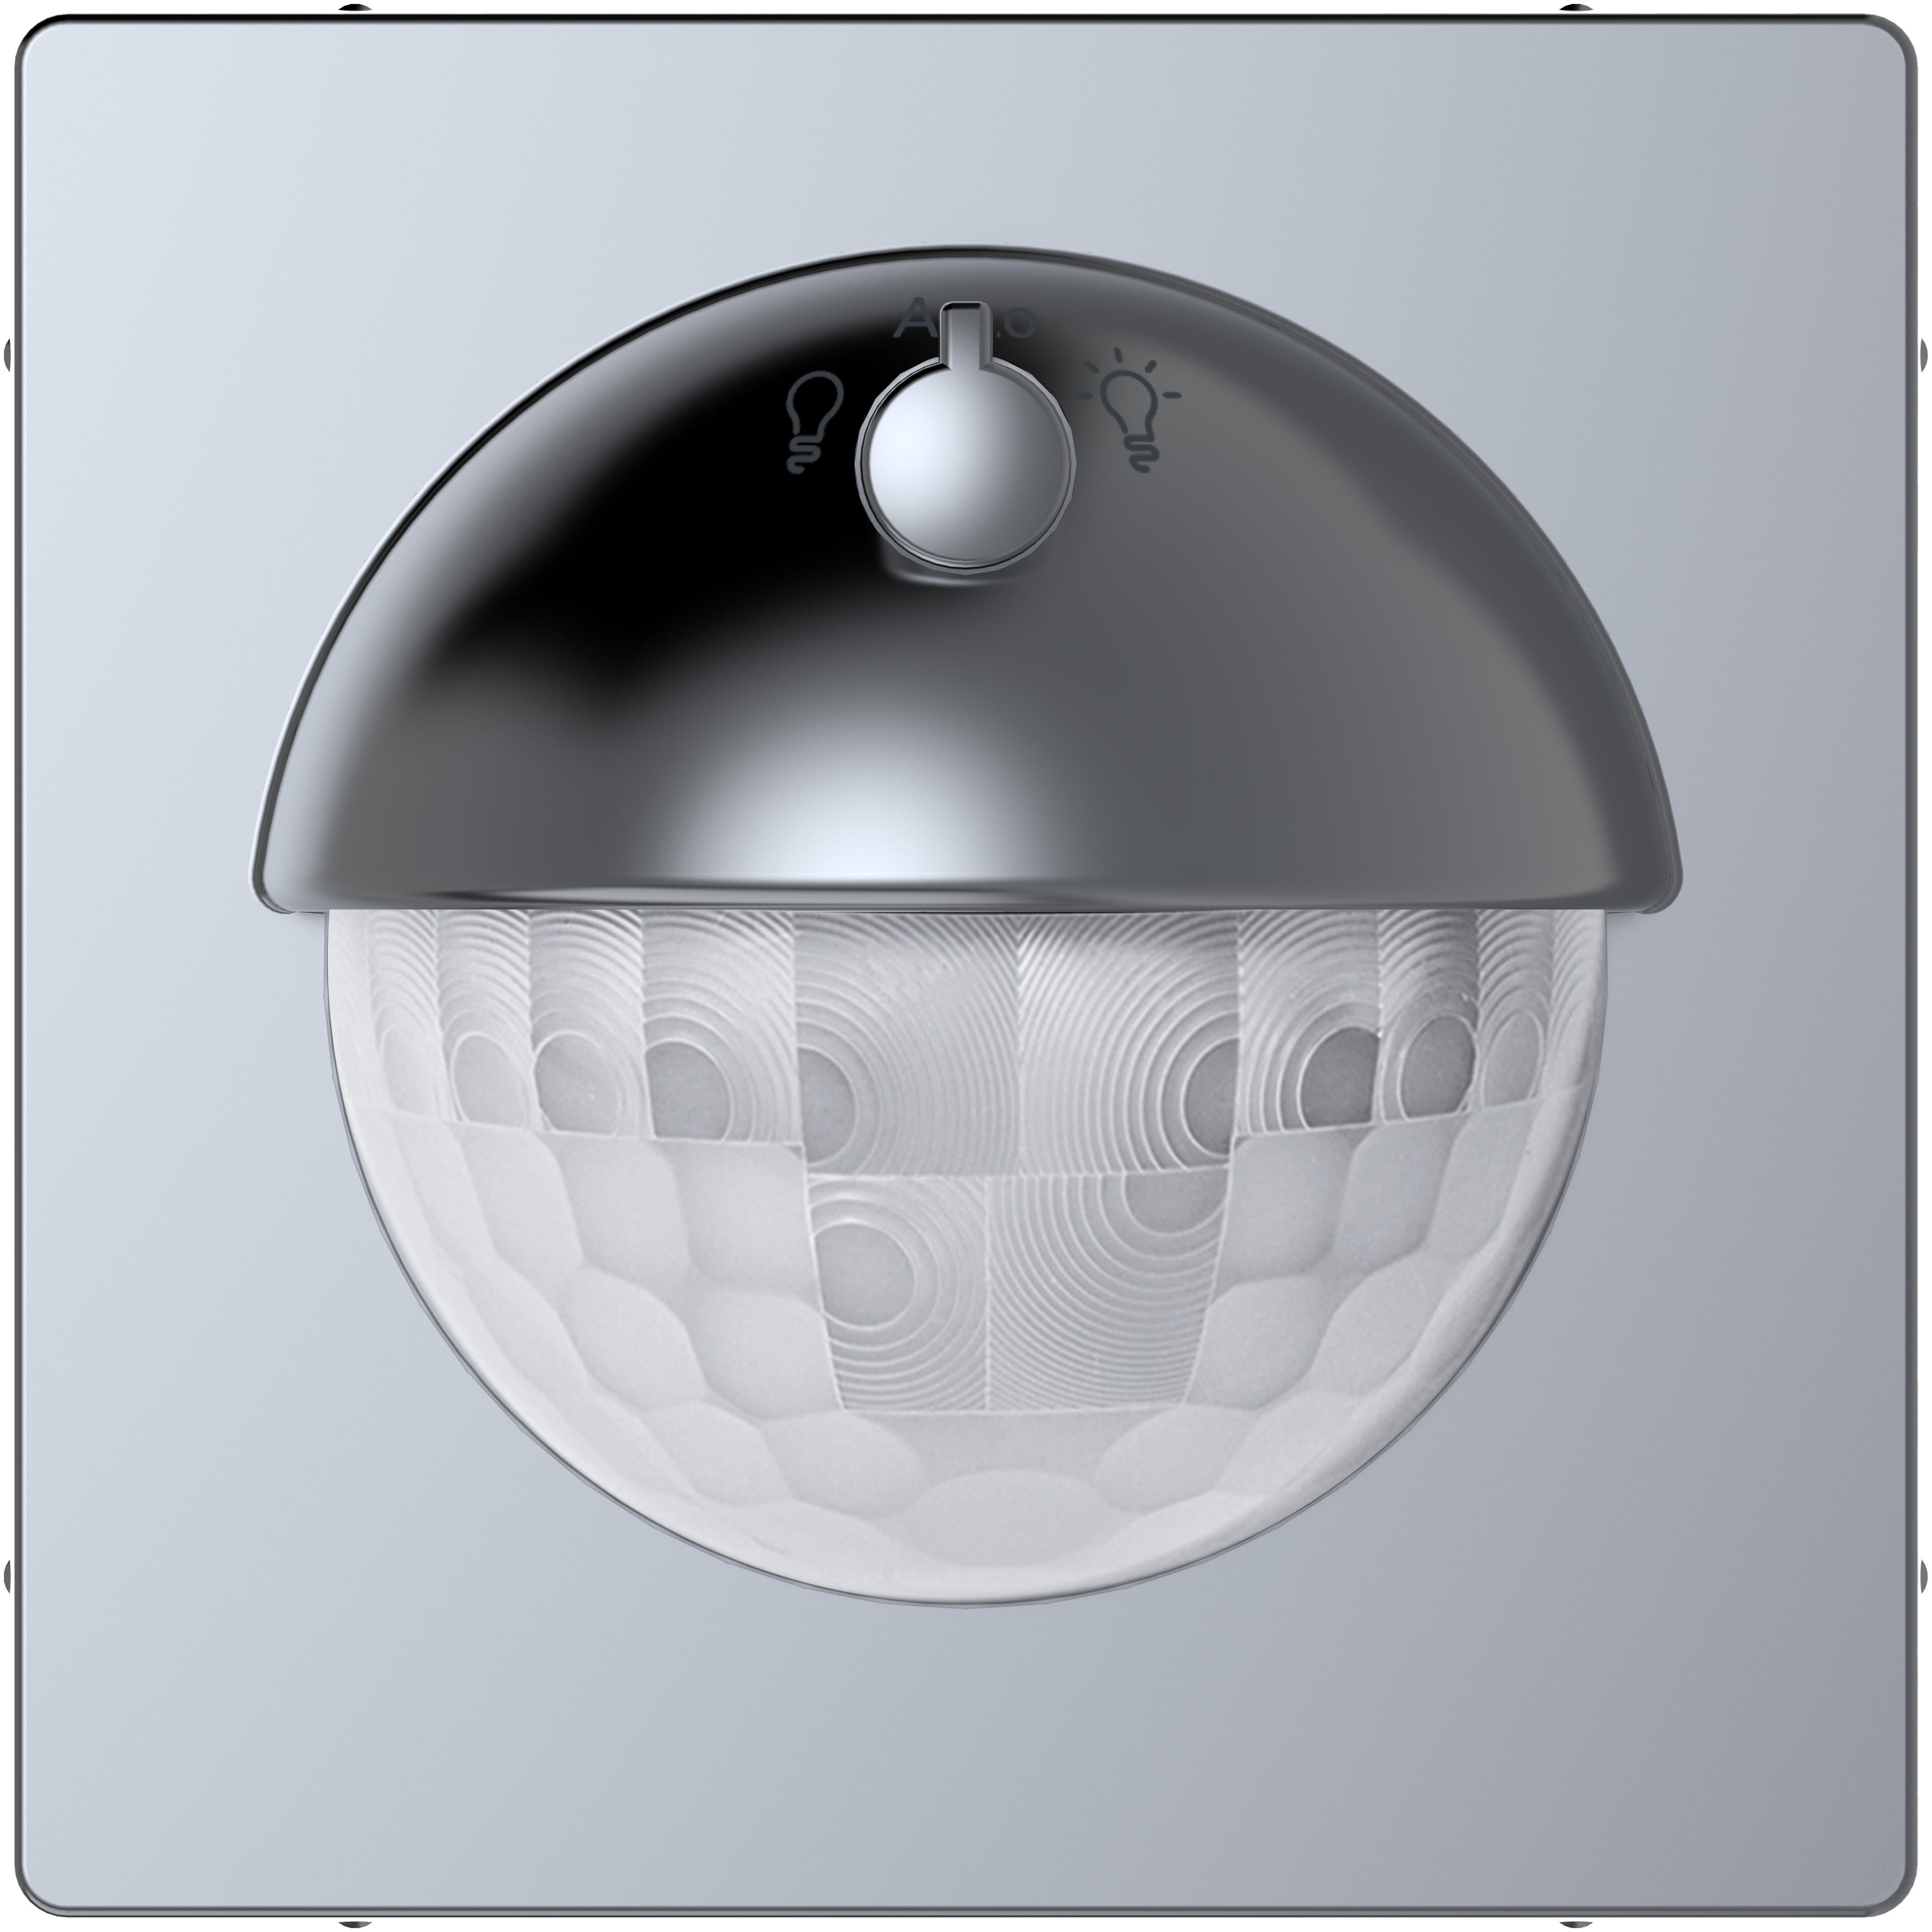 merten meg5711 6036 argus 180 up sensor modul mit schalter edelstahl online kaufen im voltus. Black Bedroom Furniture Sets. Home Design Ideas